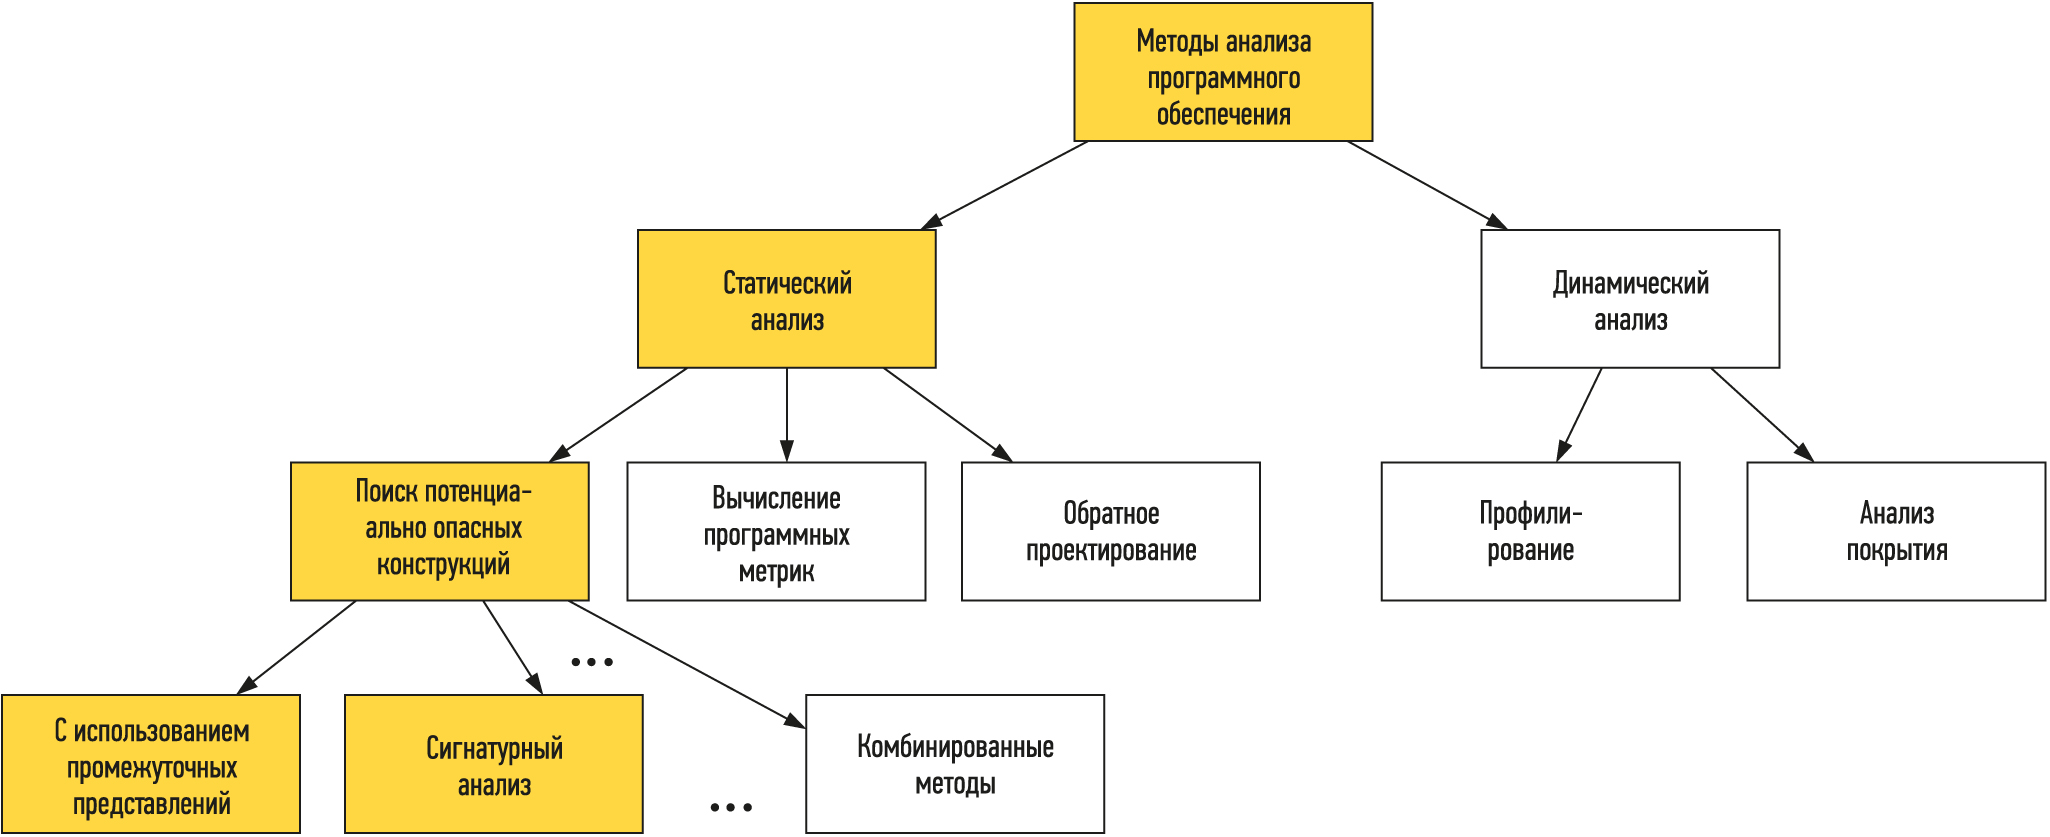 классификация видов анализа программ